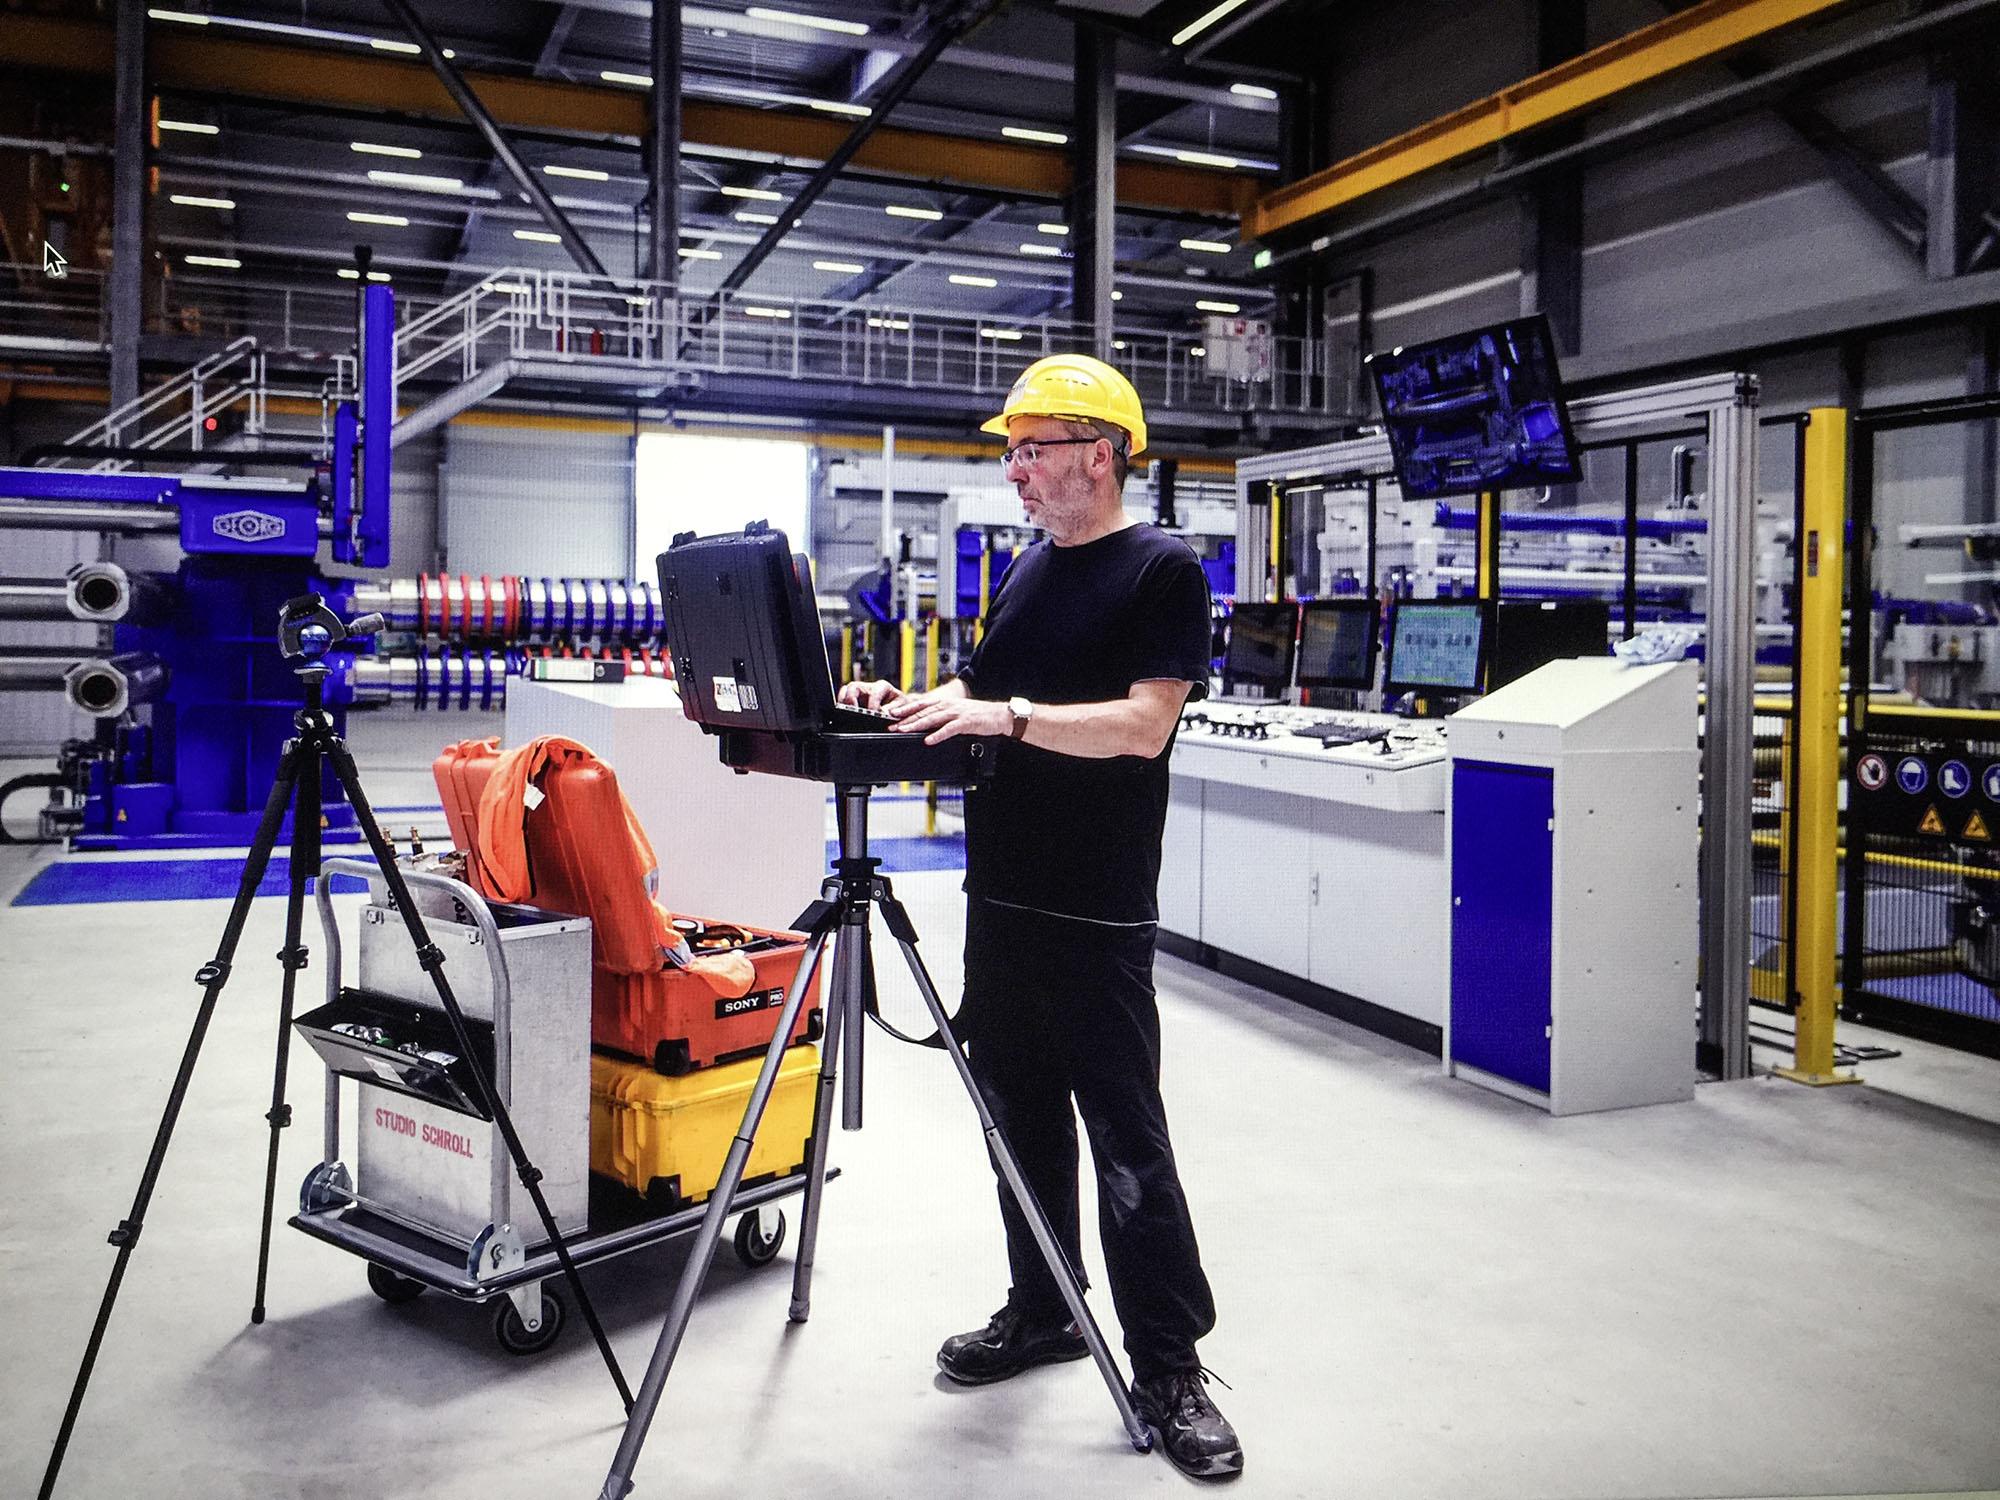 Industriefotografie